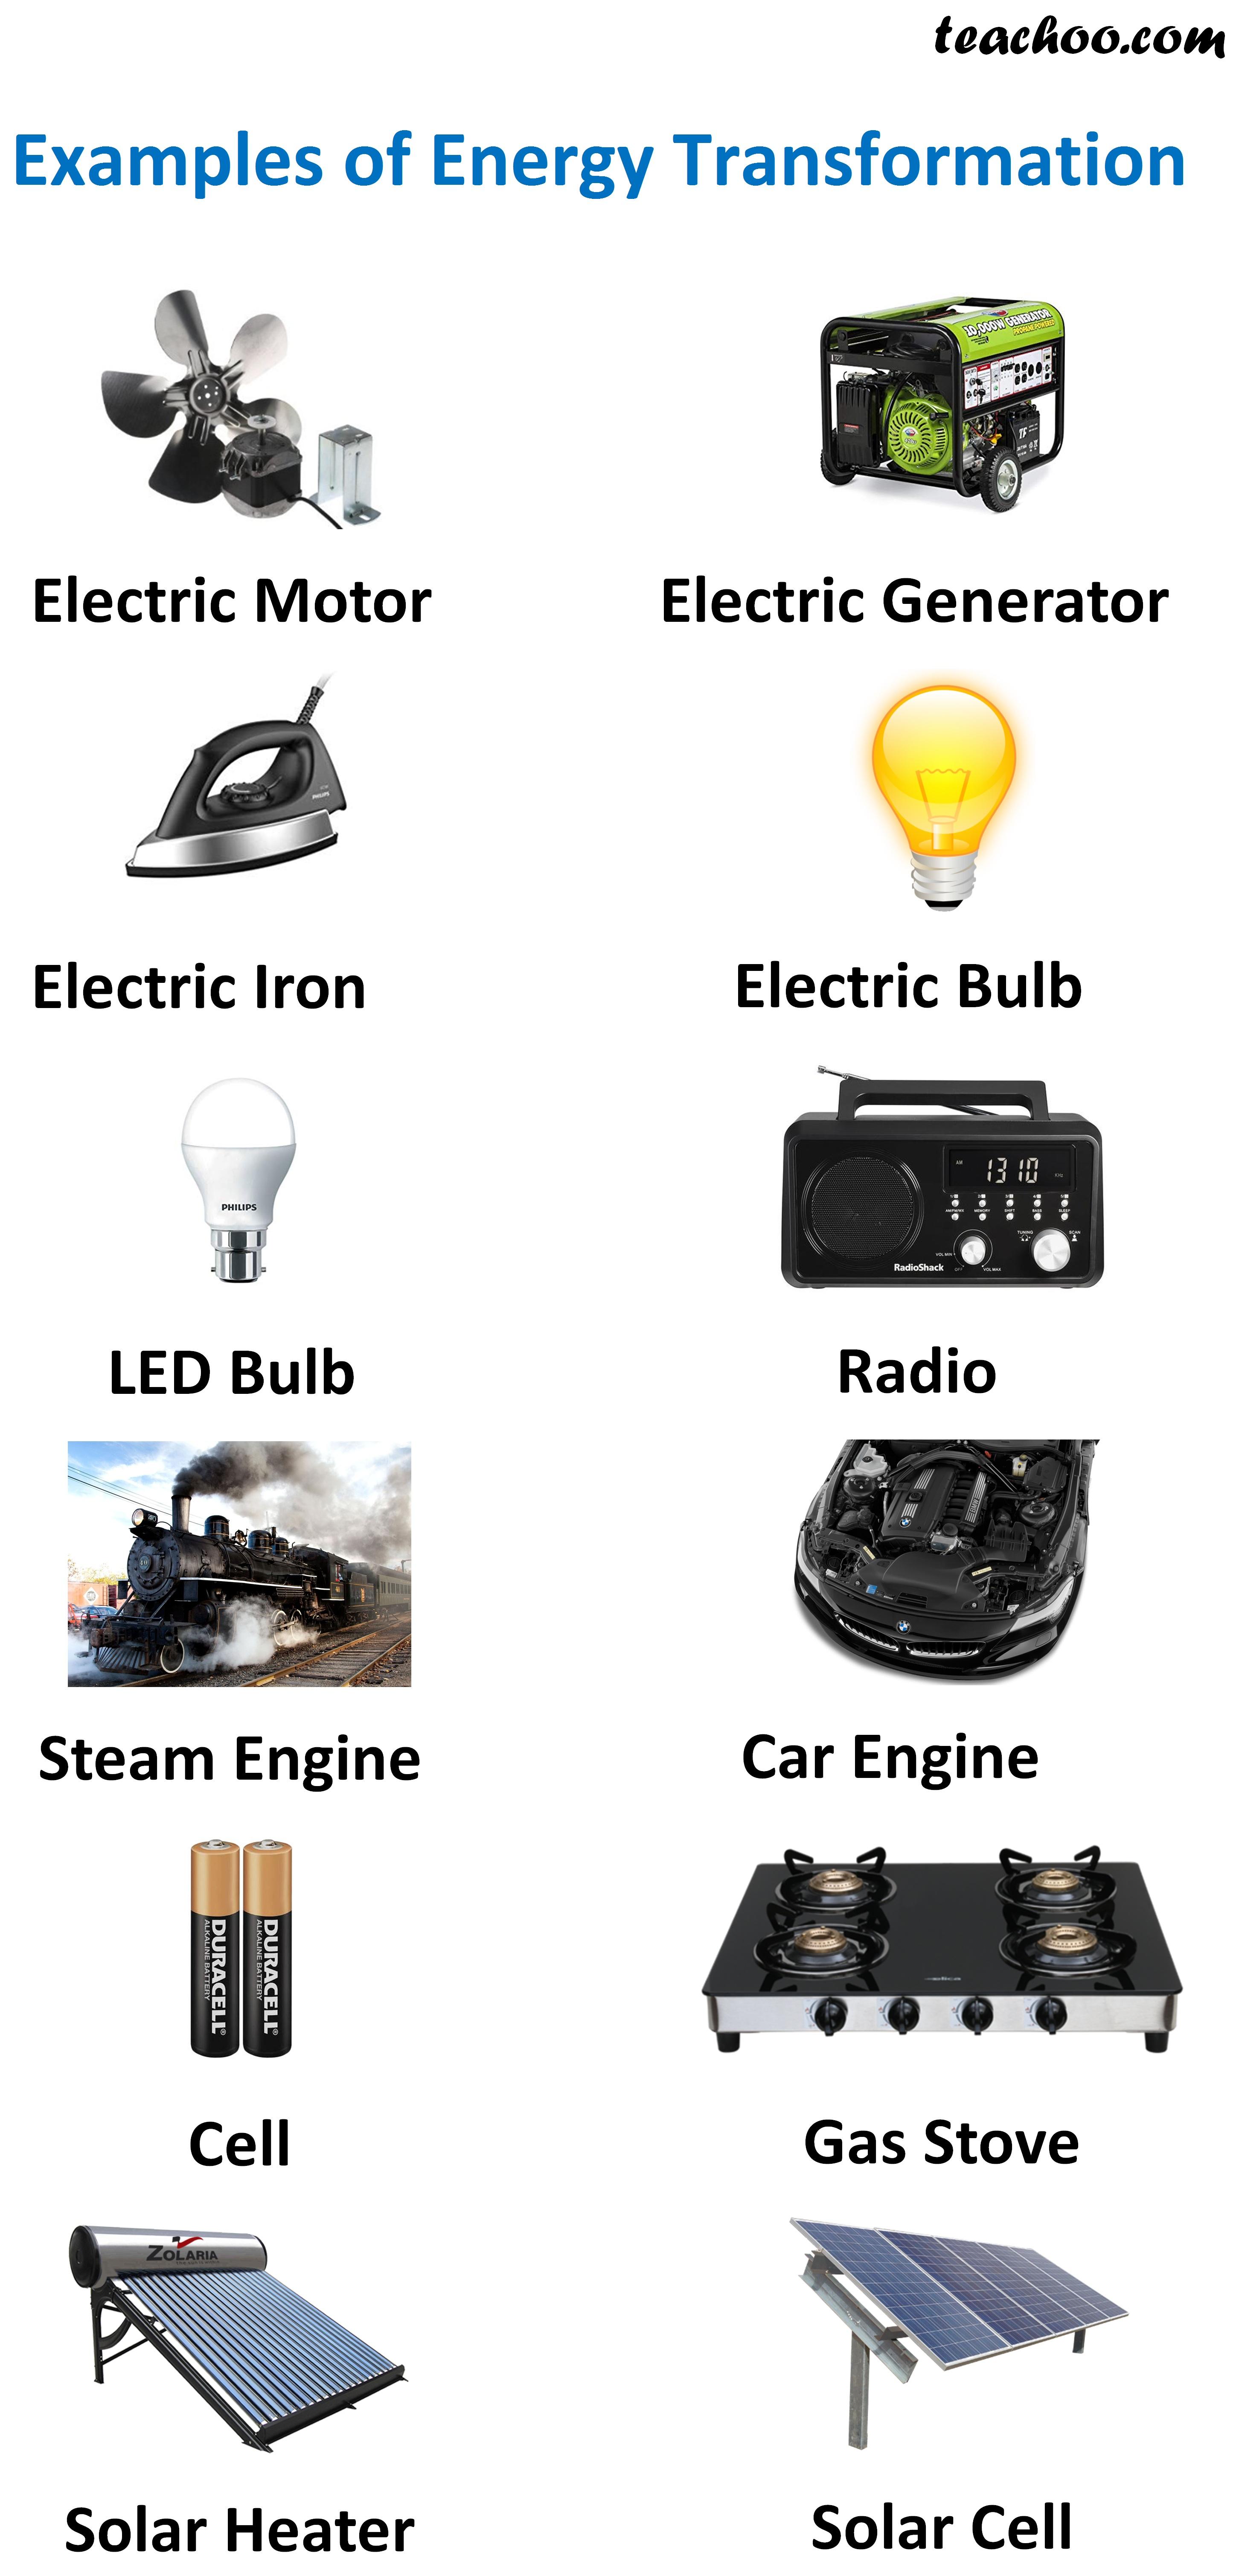 Energy transformation examples hamle. Rsd7. Org.